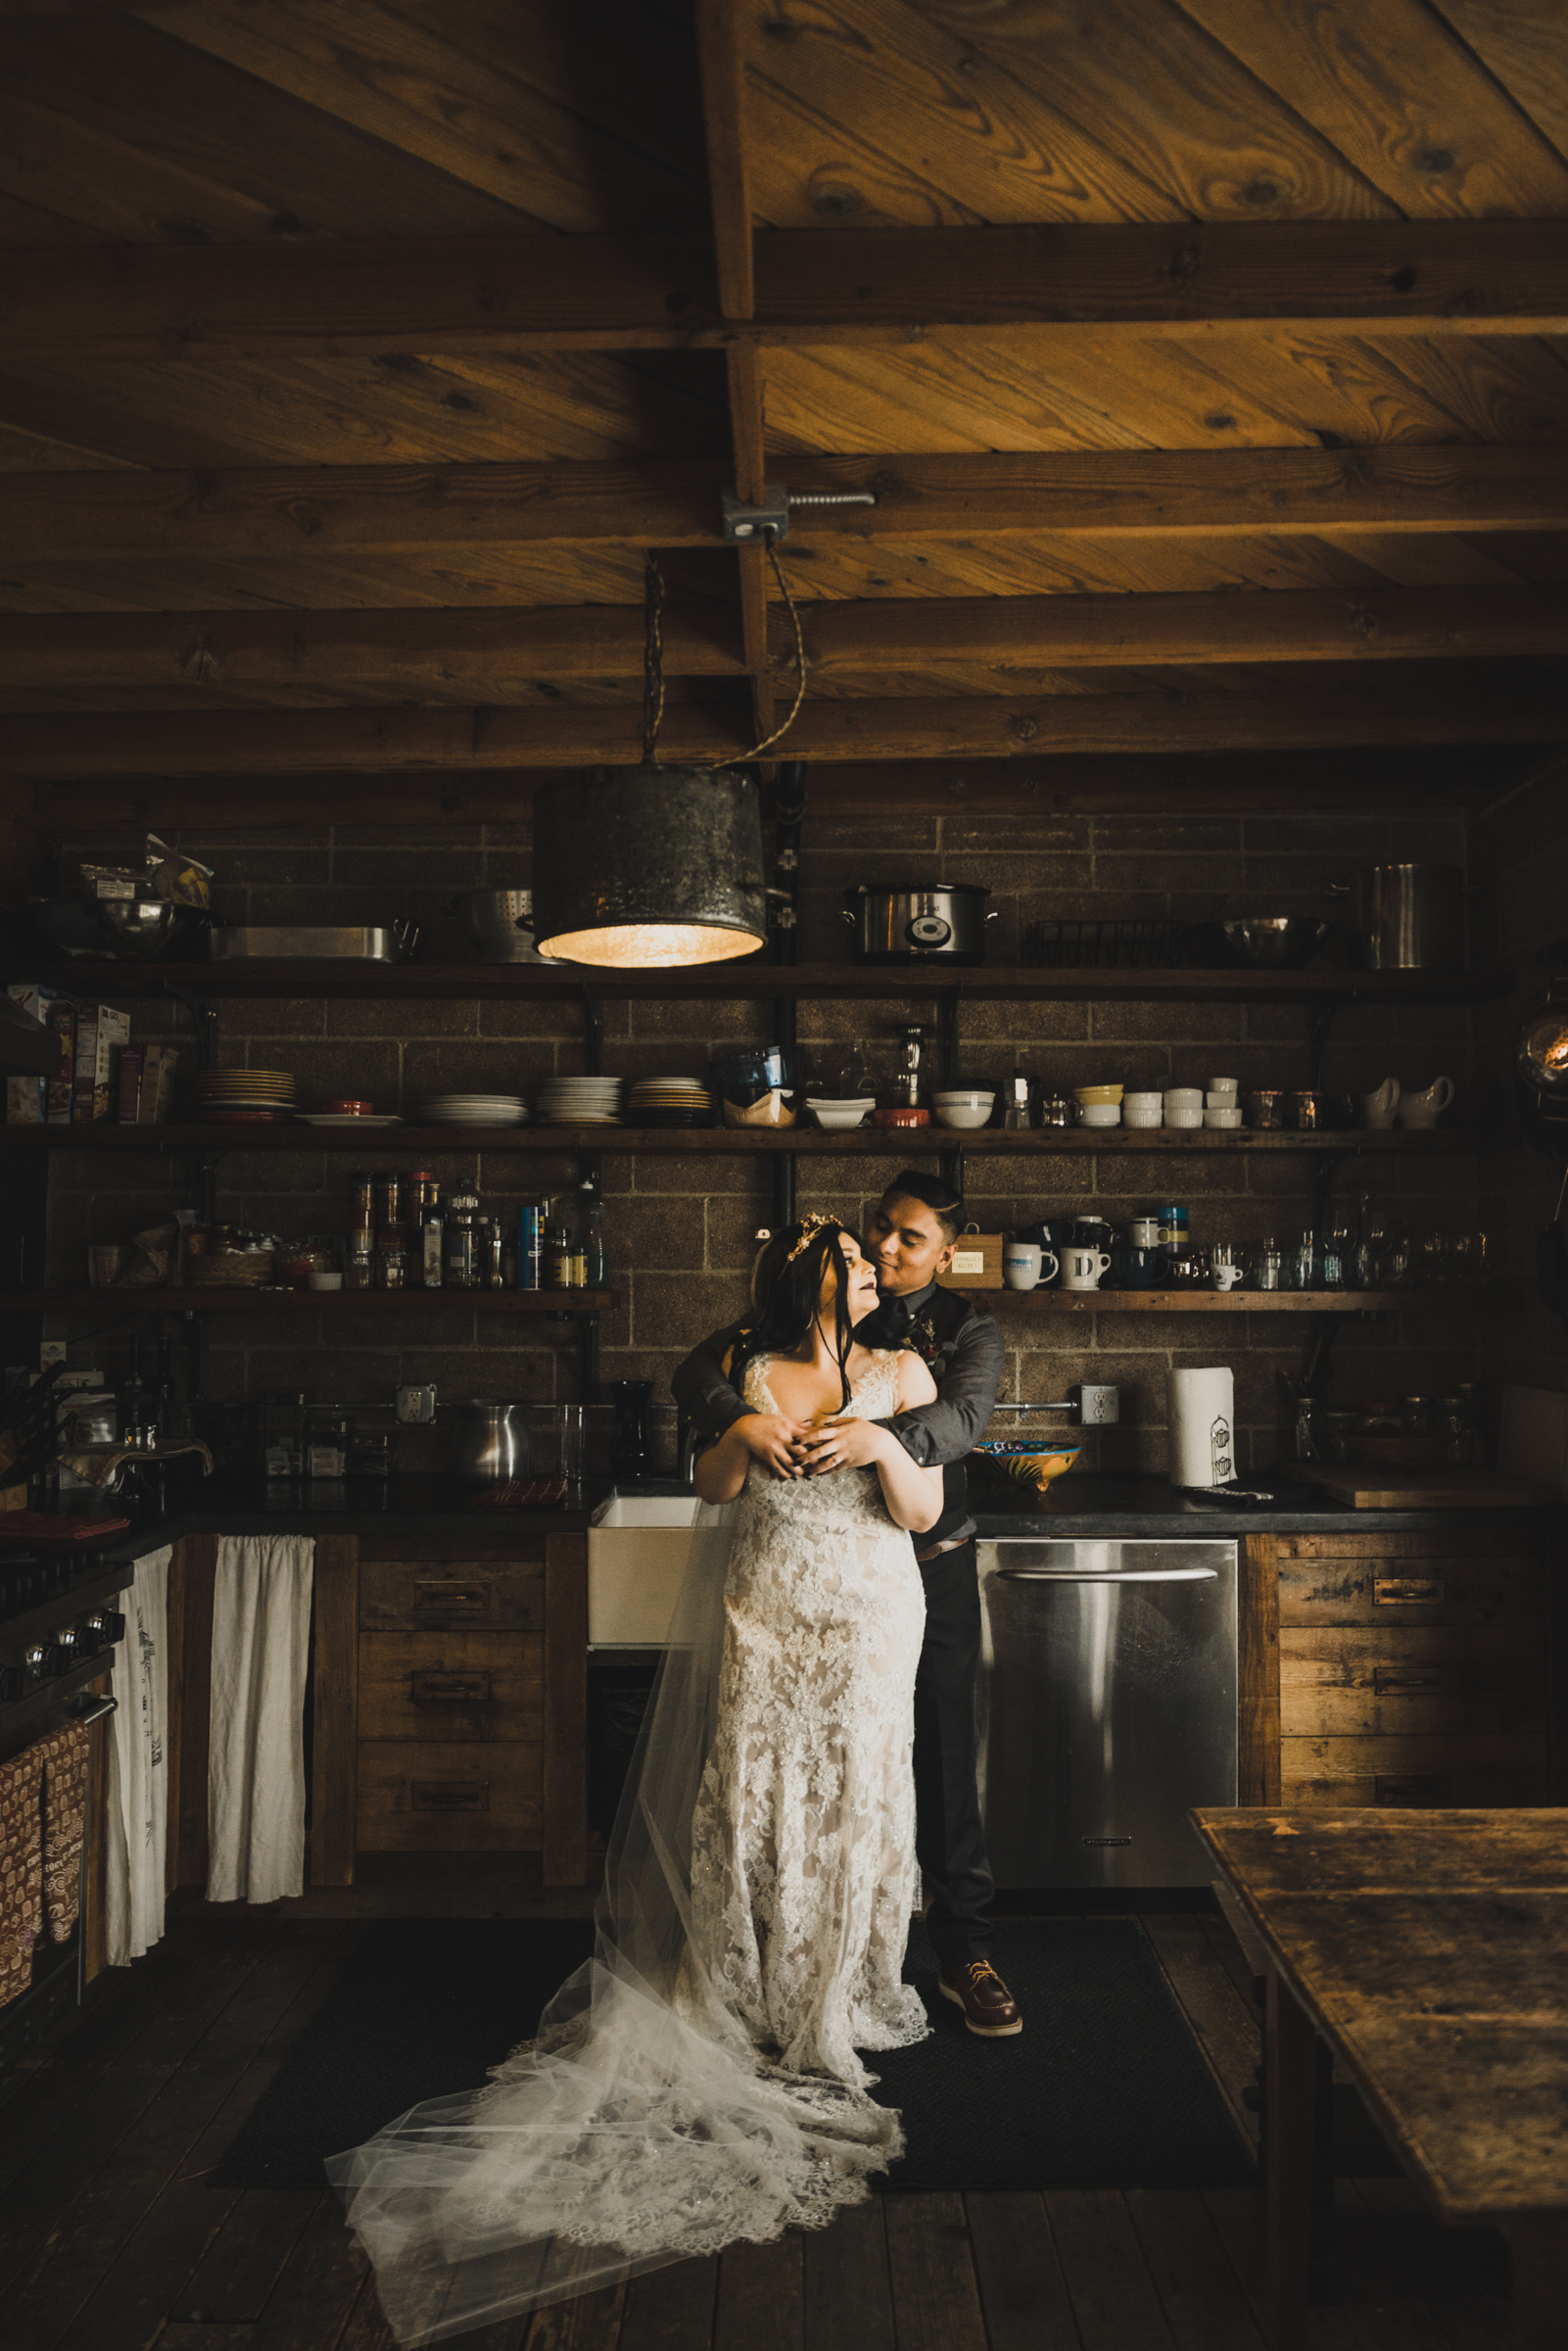 ©Isaiah + Taylor Photography - Smoky Hollow Studios Wedding, El Segundo, Los Angeles Wedding Photographer-69.jpg